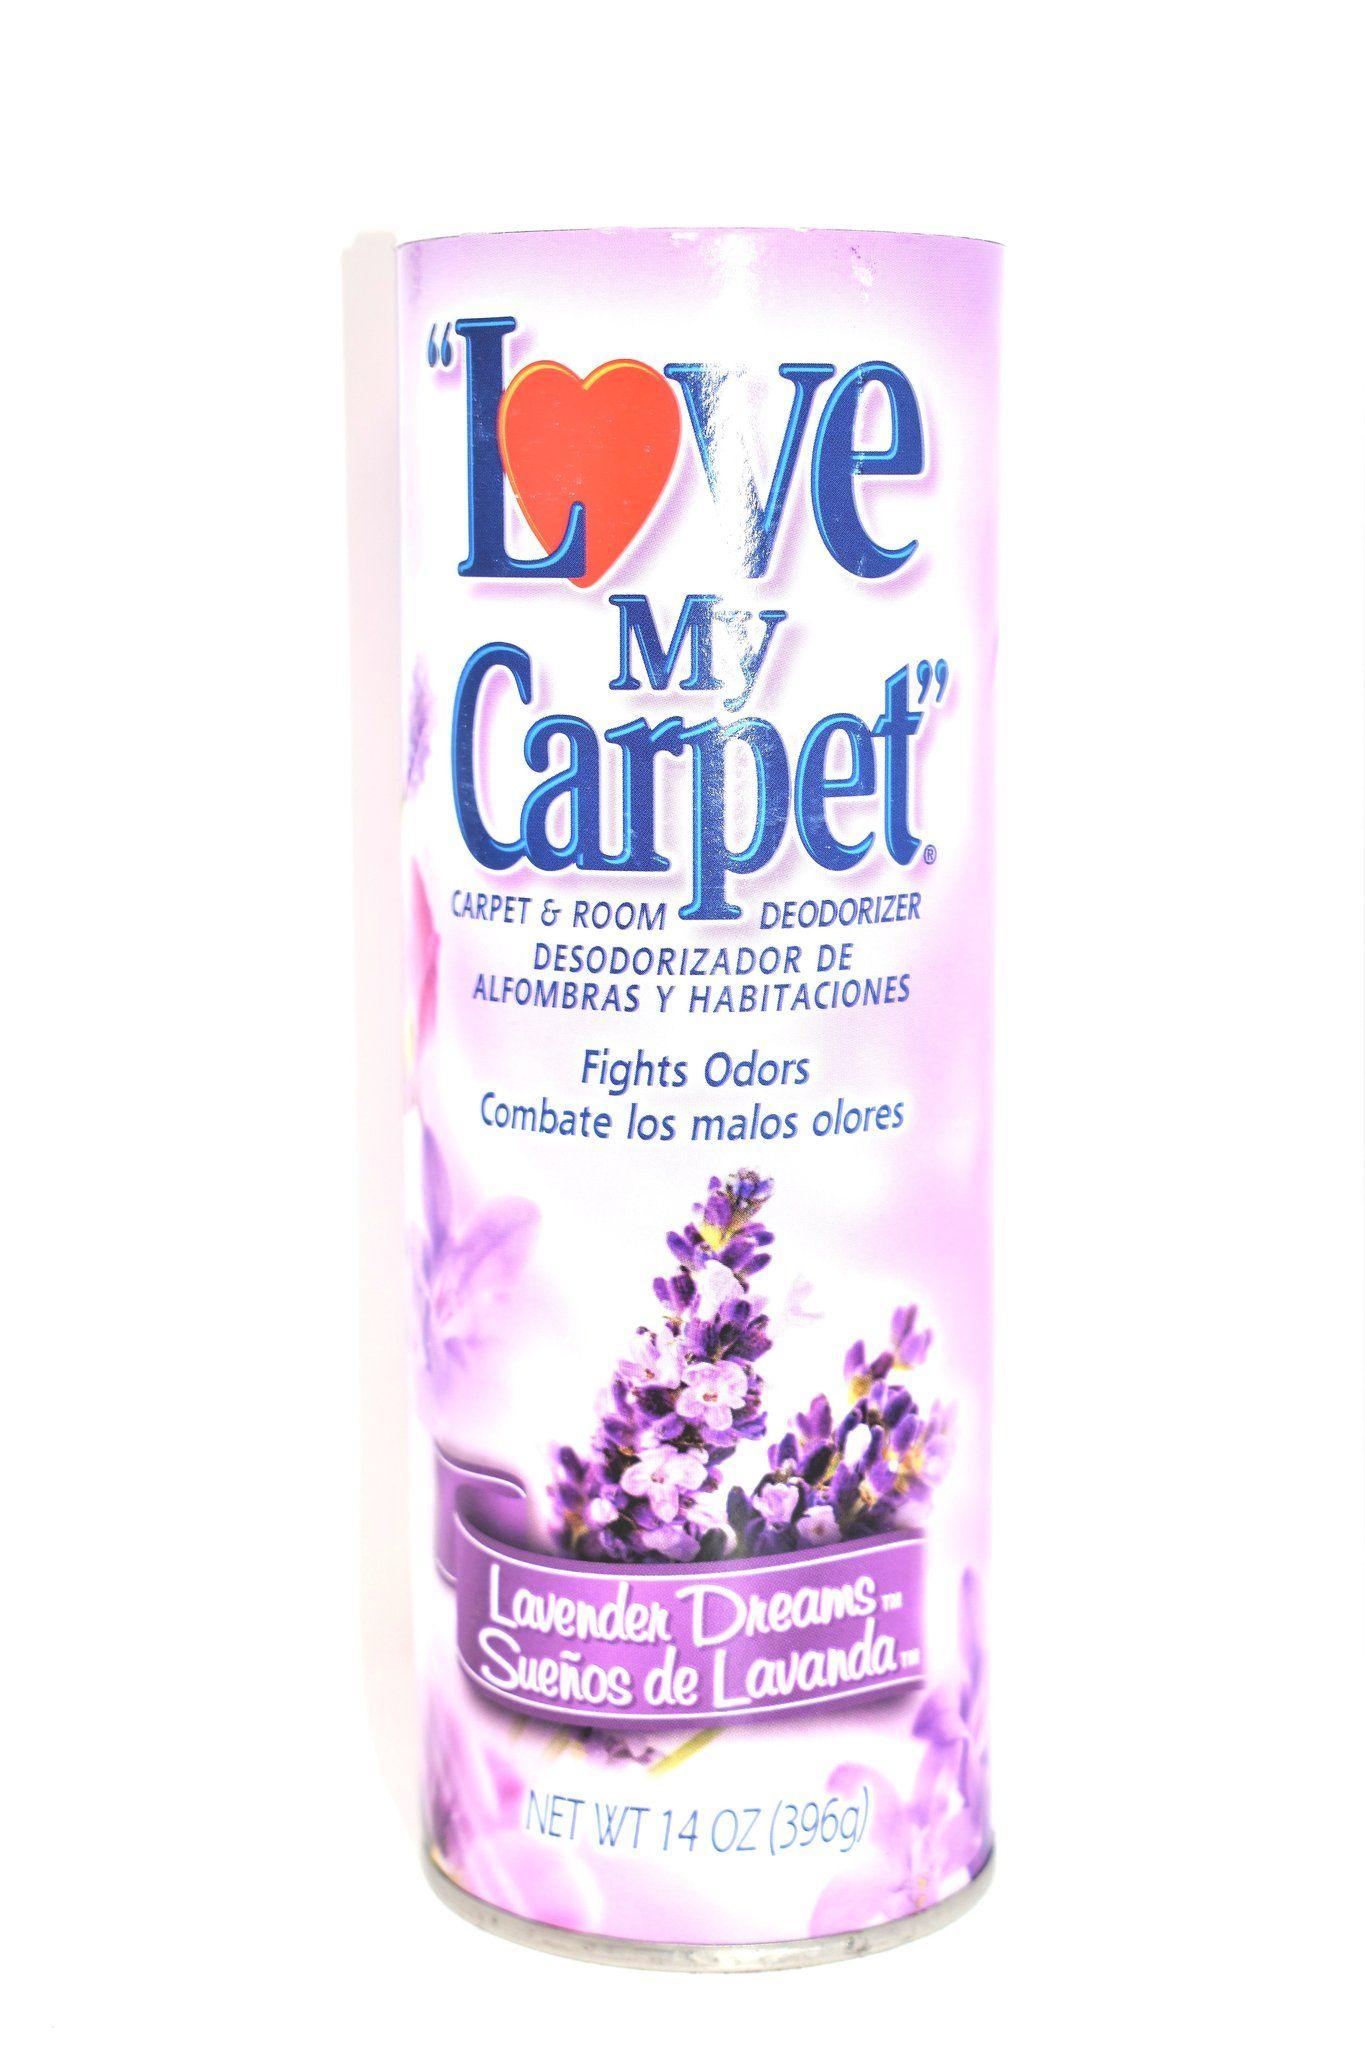 Love My Carpet Lavender Dreams Carpet Room Deodorizer 14 Oz Marketcol Room Deodorizer Lavender Fragrance Deodorant